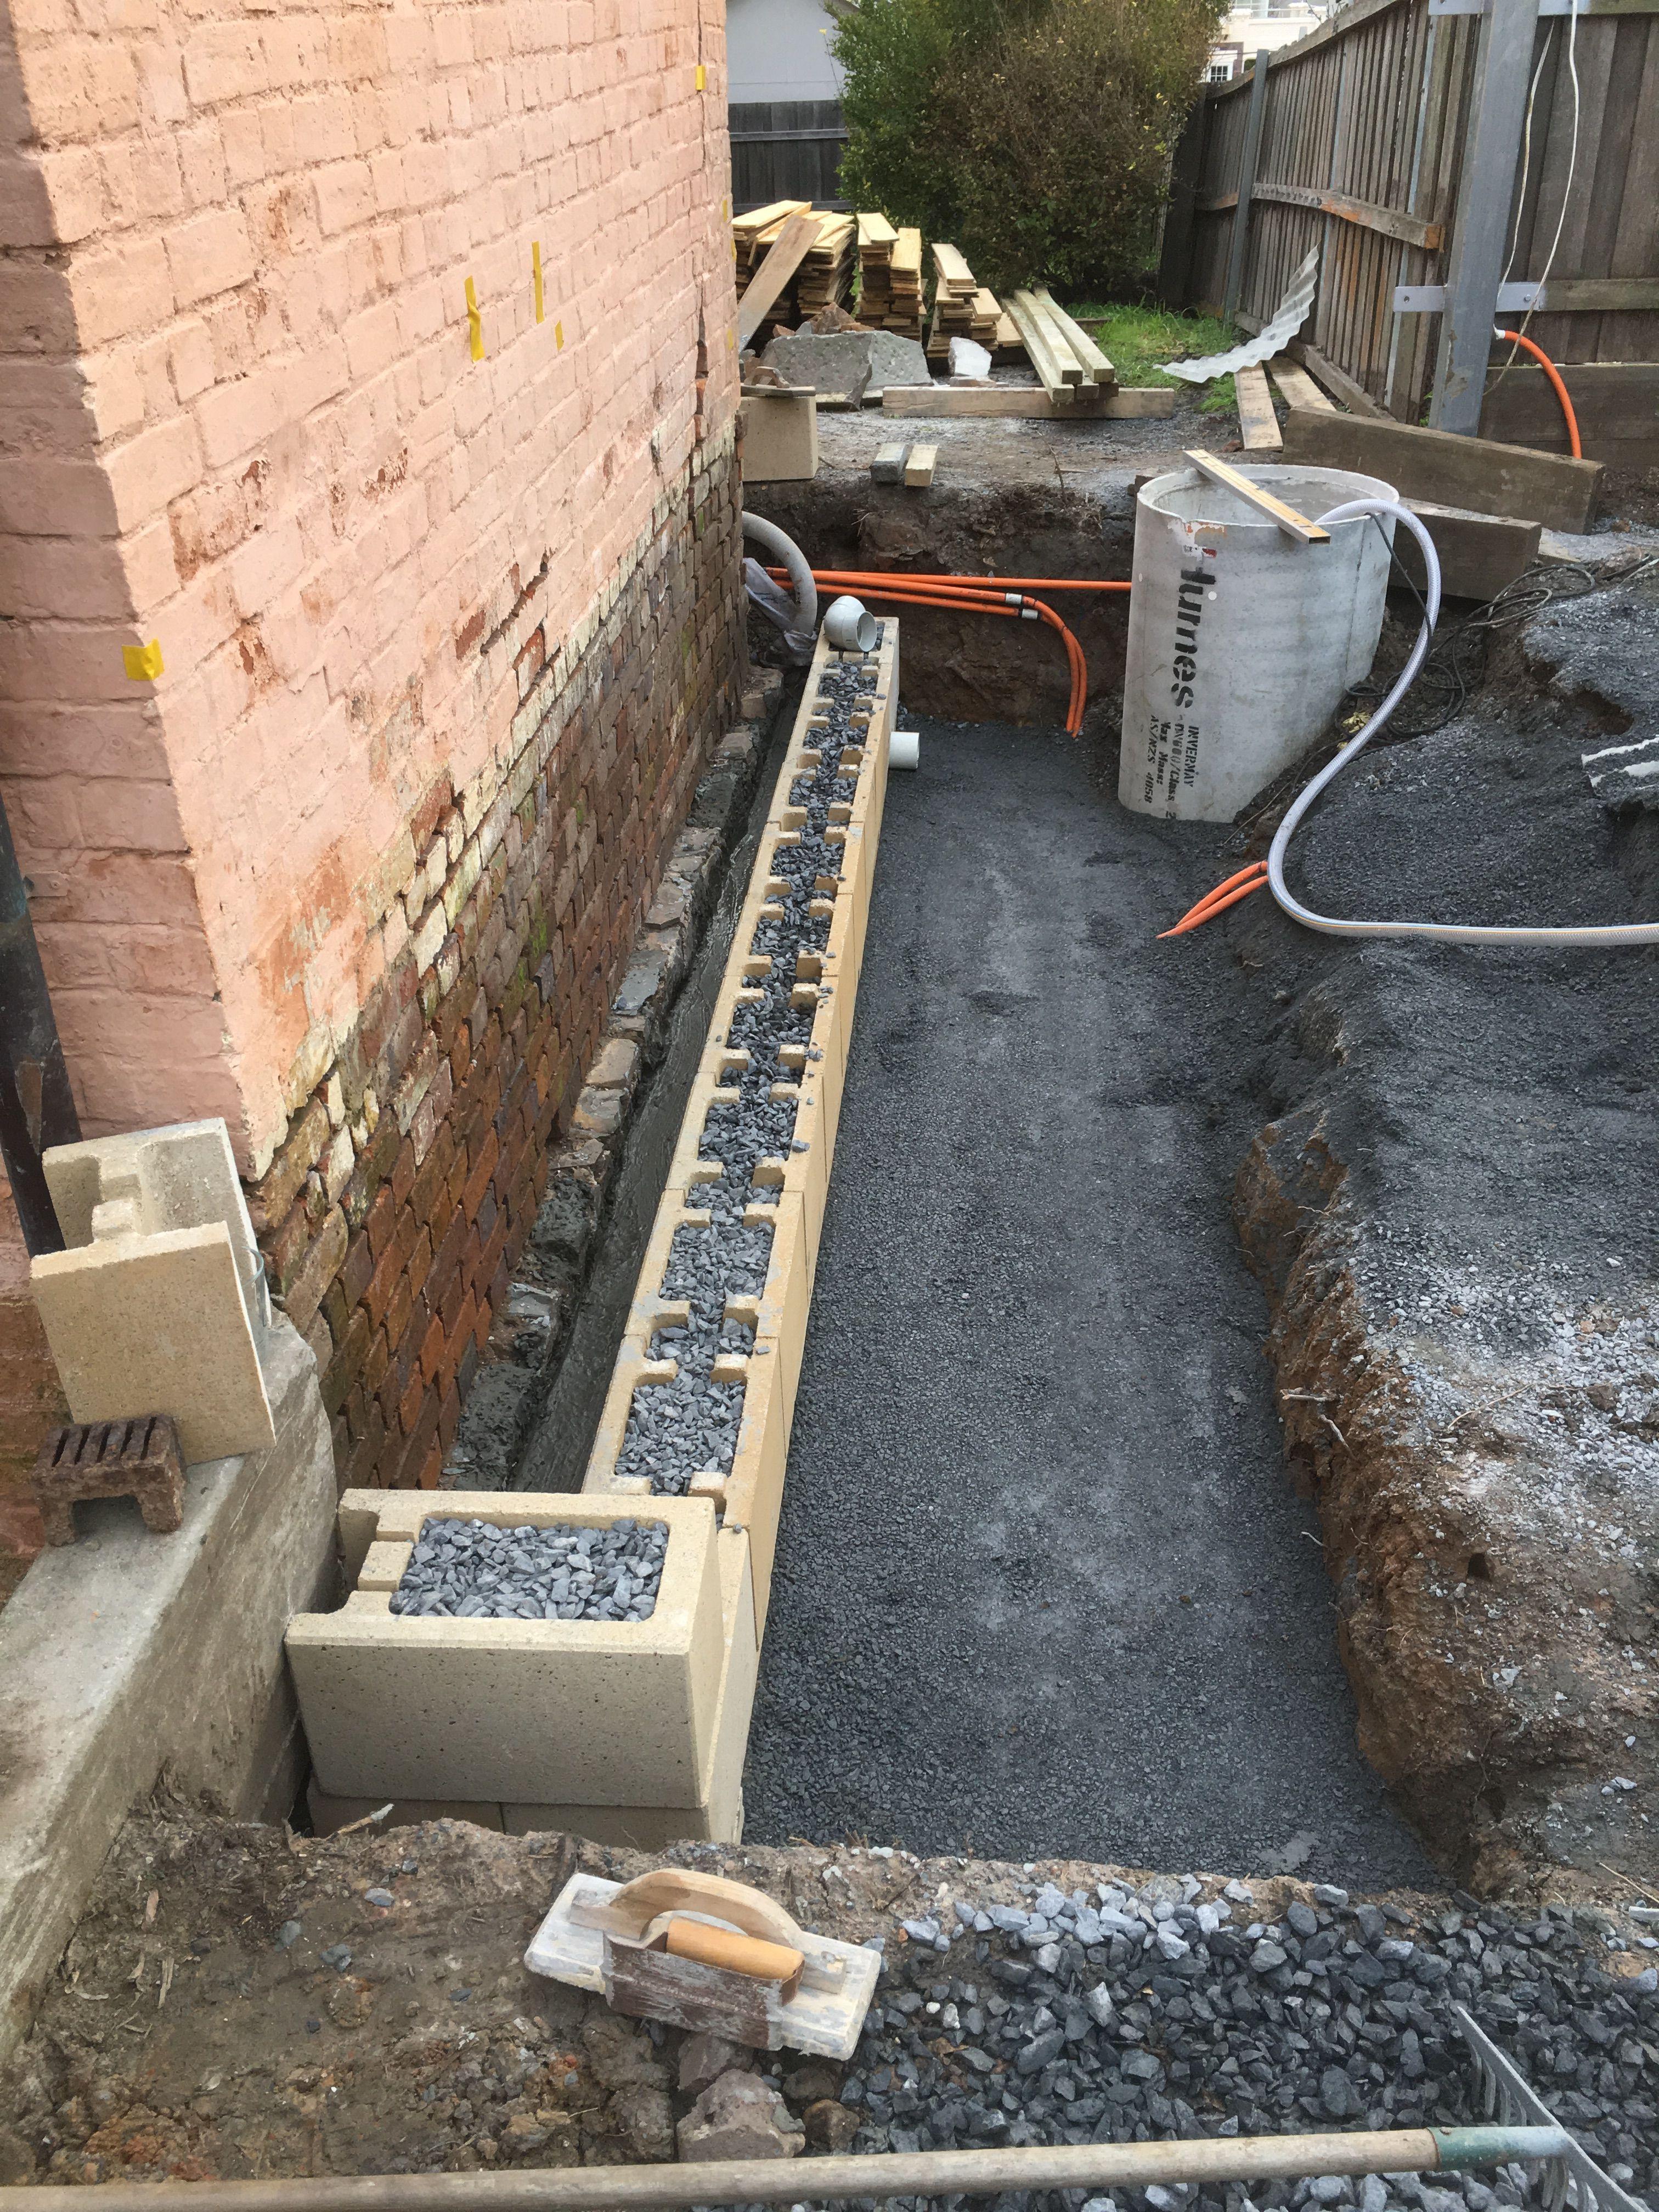 Property Drainage Works Retaining Wall Under Construction T Property Drainage Works Retainin In 2020 Waterproofing Basement Yard Drainage Retaining Wall Drainage